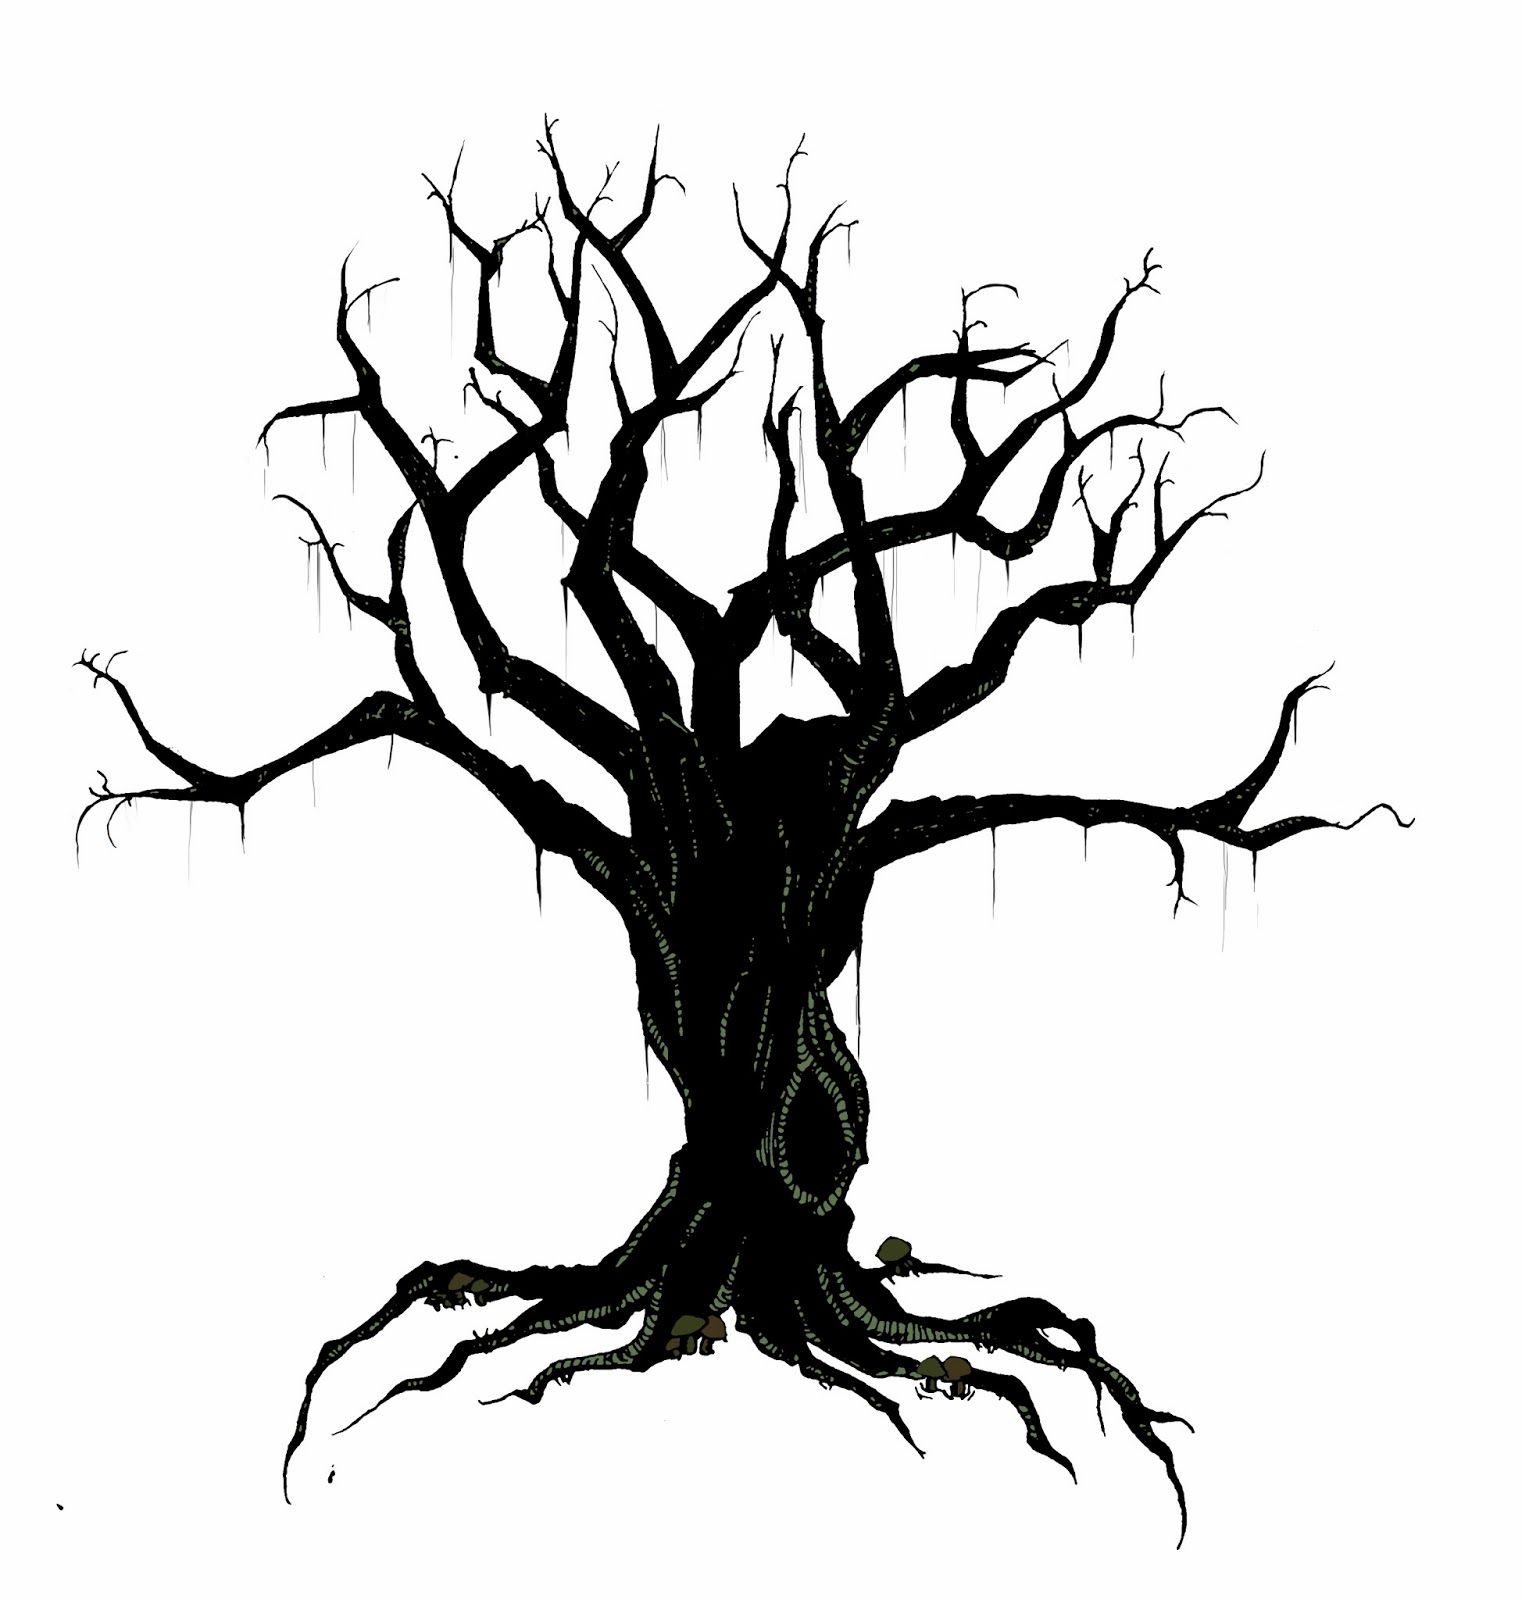 medium resolution of creepy bird in tree silhouette creepy tree